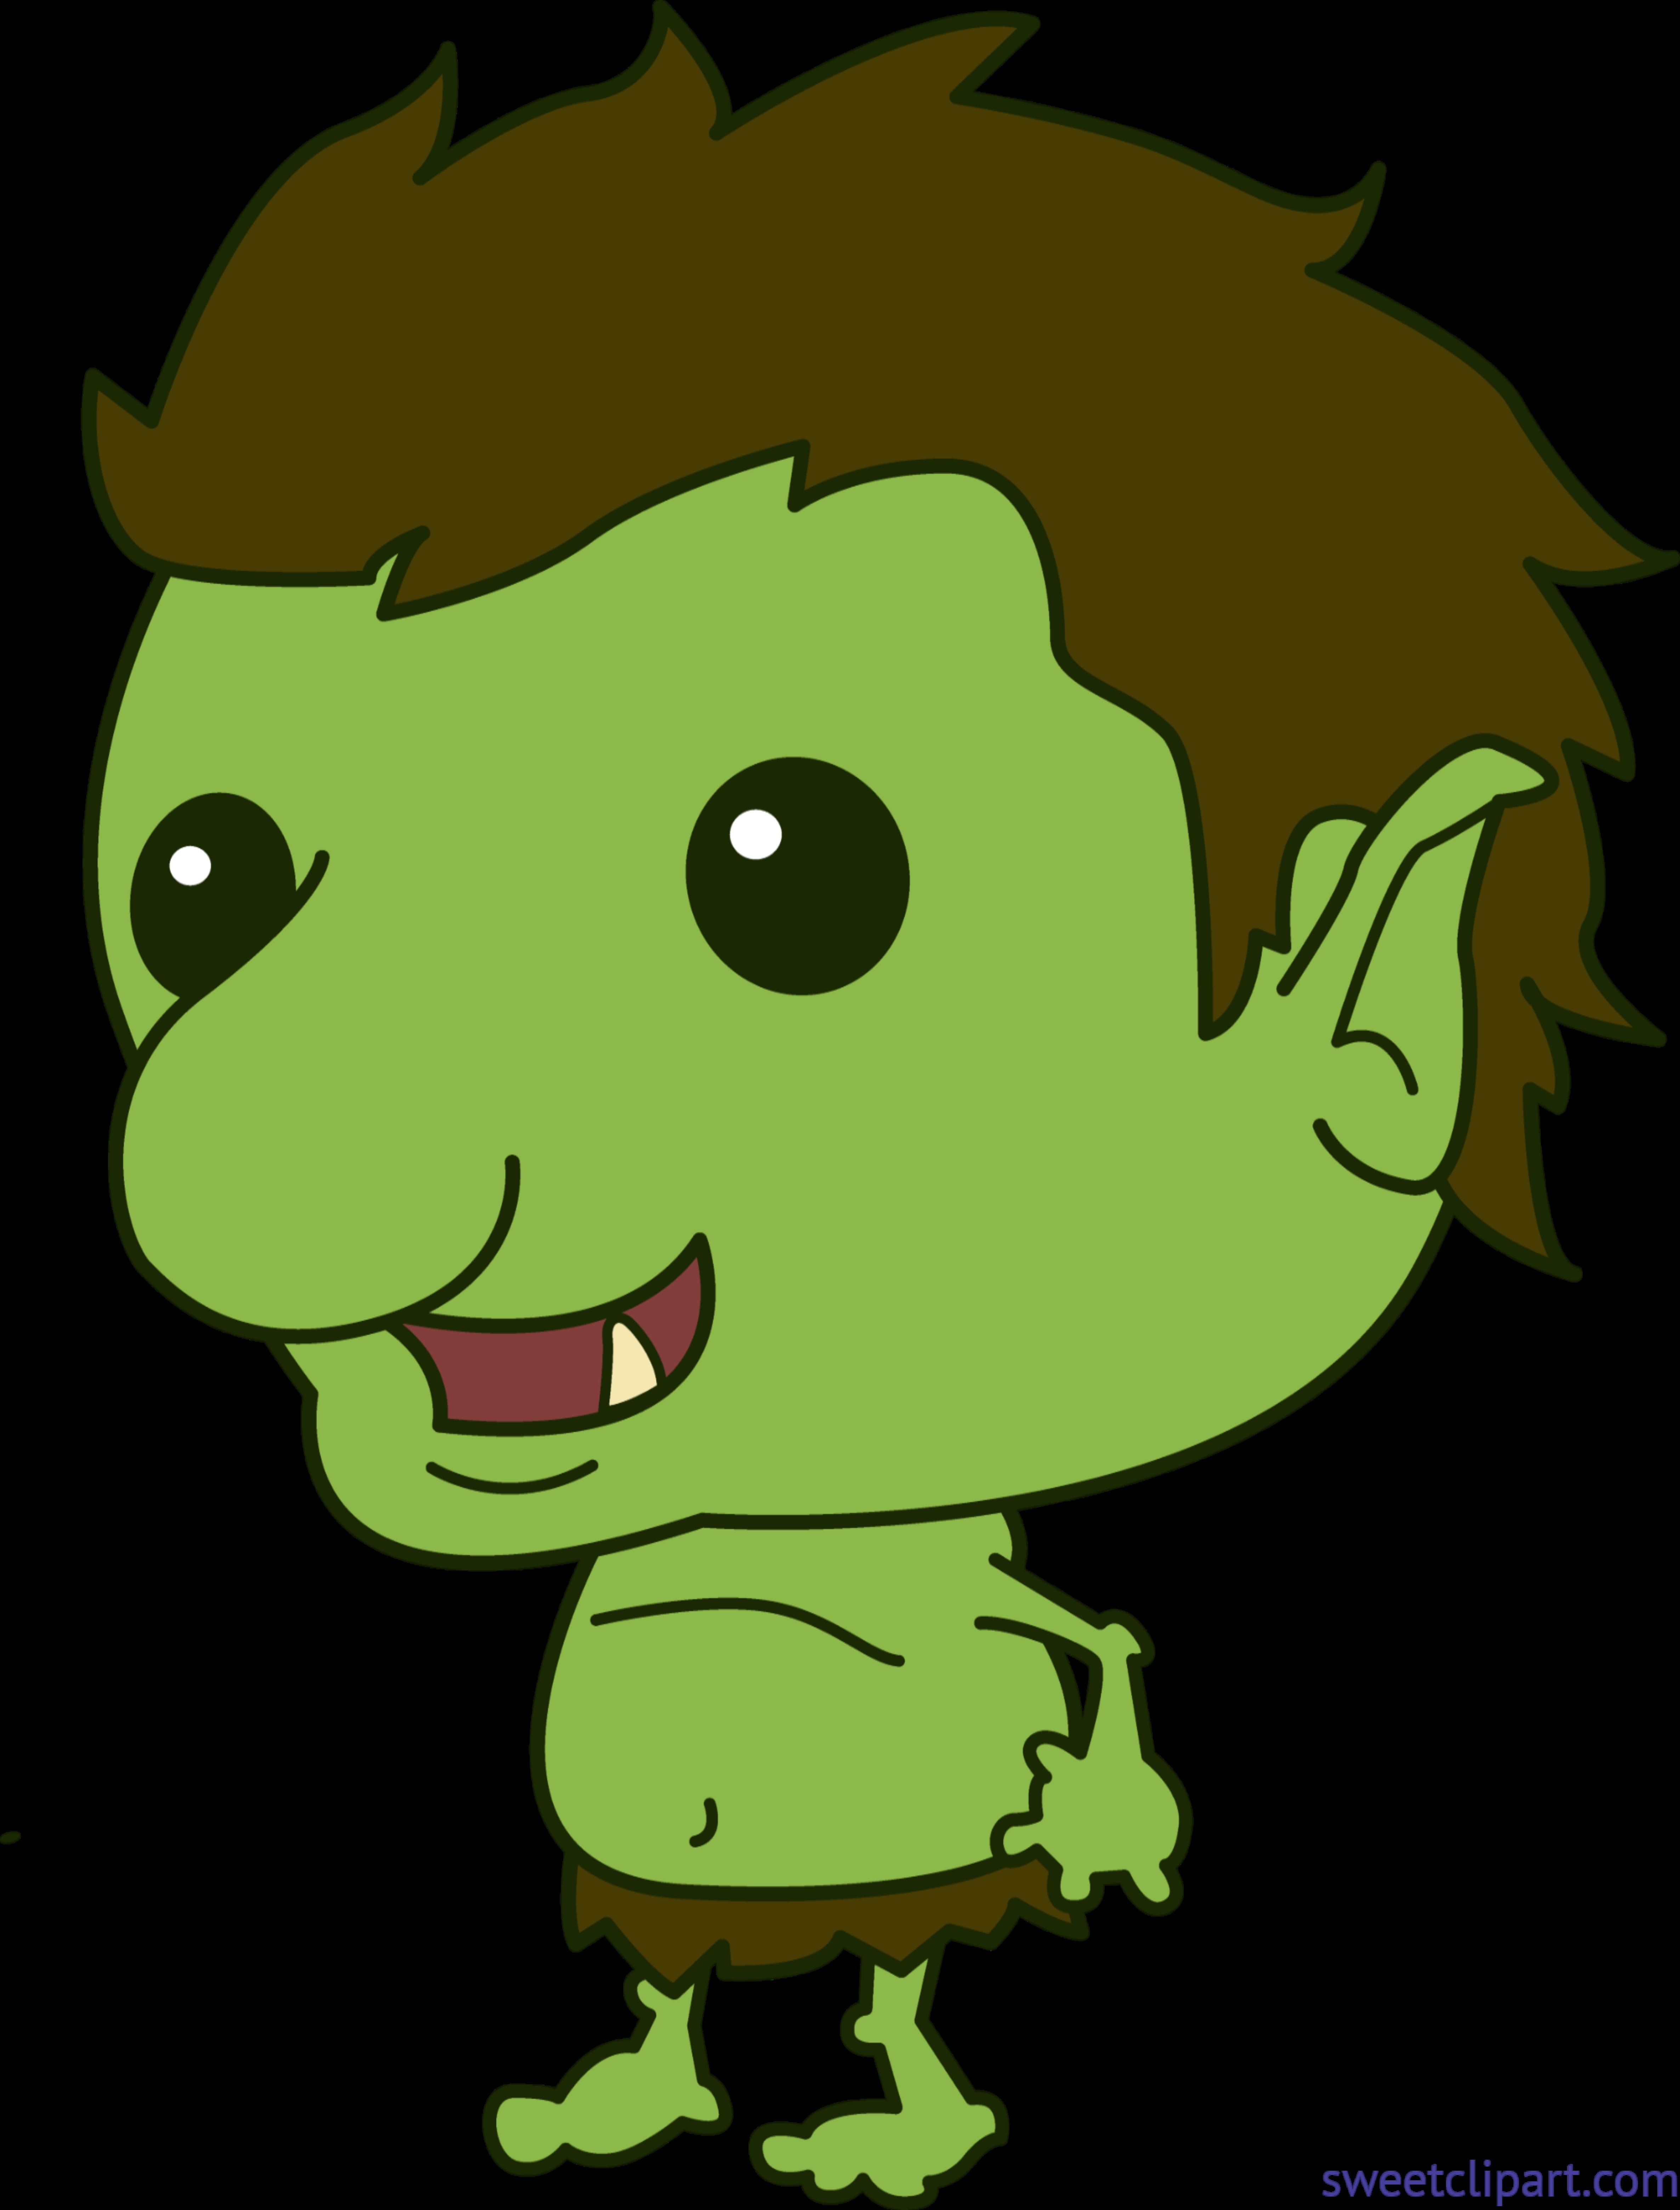 download Cute clip art sweet. Troll clipart